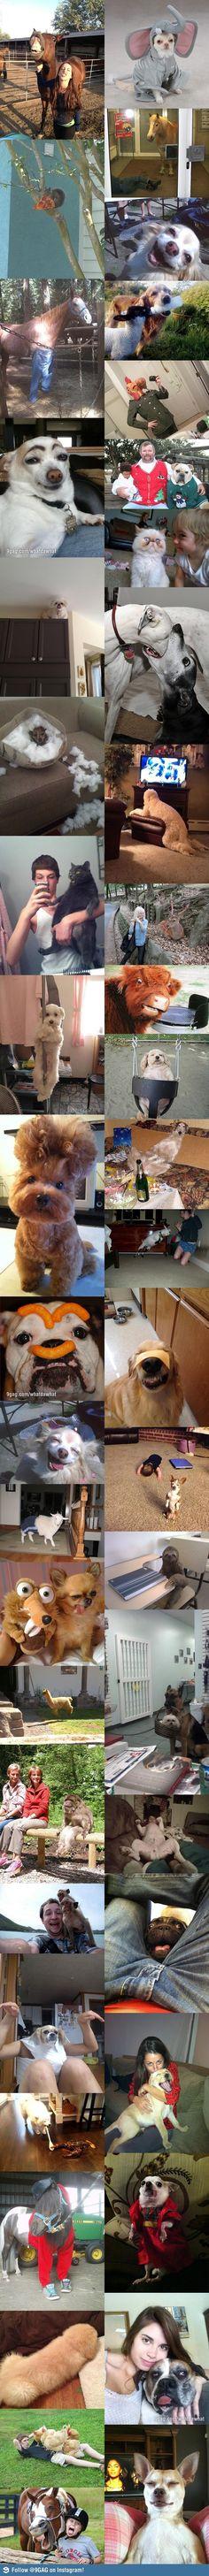 Most WTF animal pics of 2012